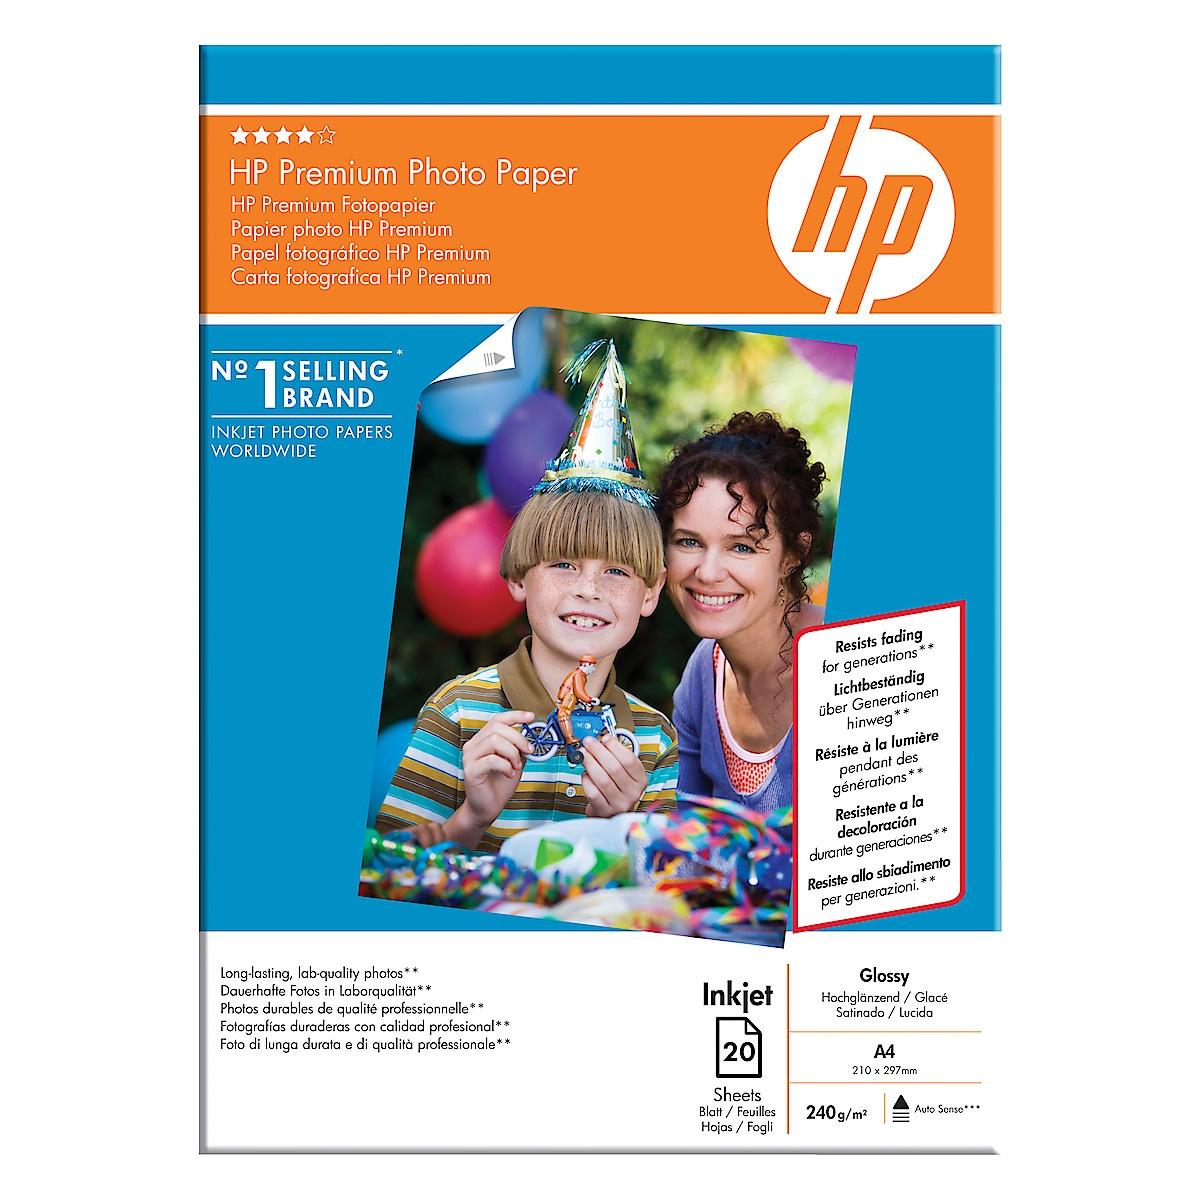 Bläckstrålepapper A4 HP Premium photo paper, Glossy